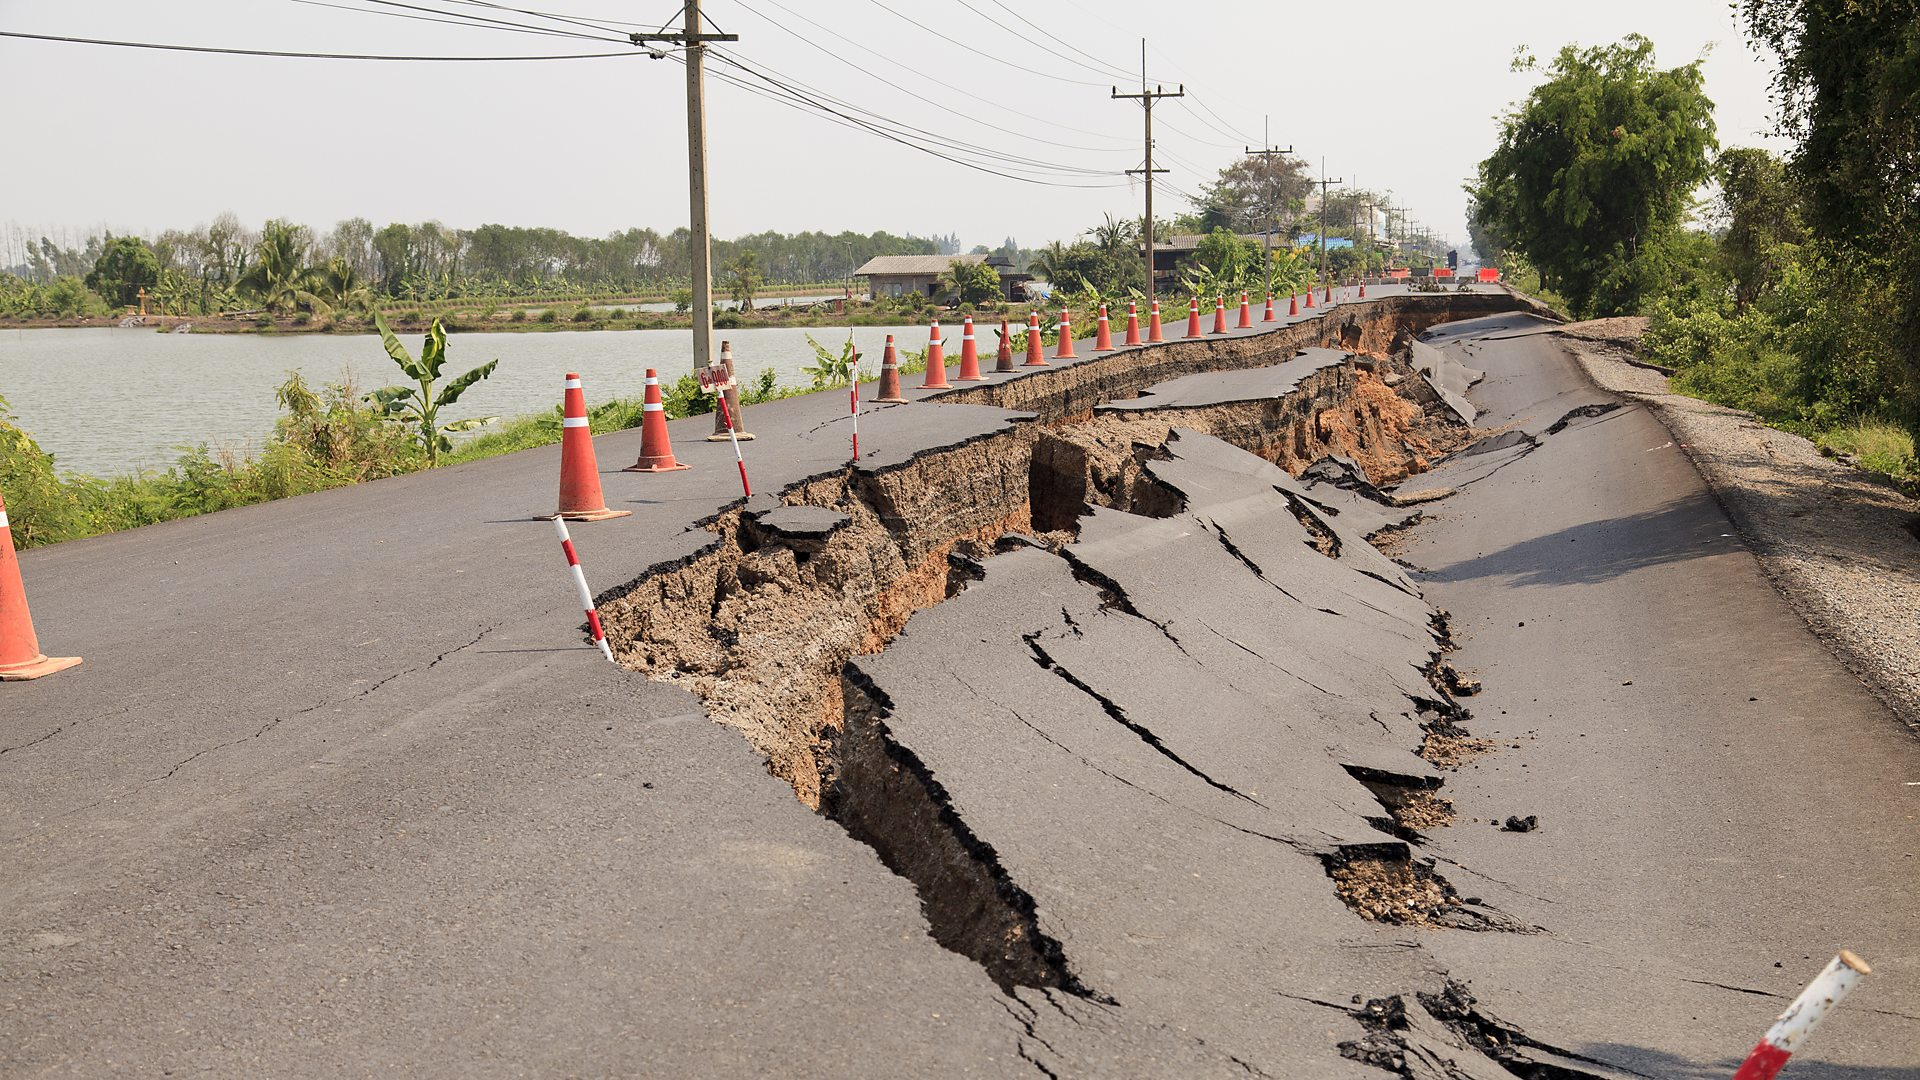 BBC Radio 4 - Quake - 12 surprising facts about earthquakes